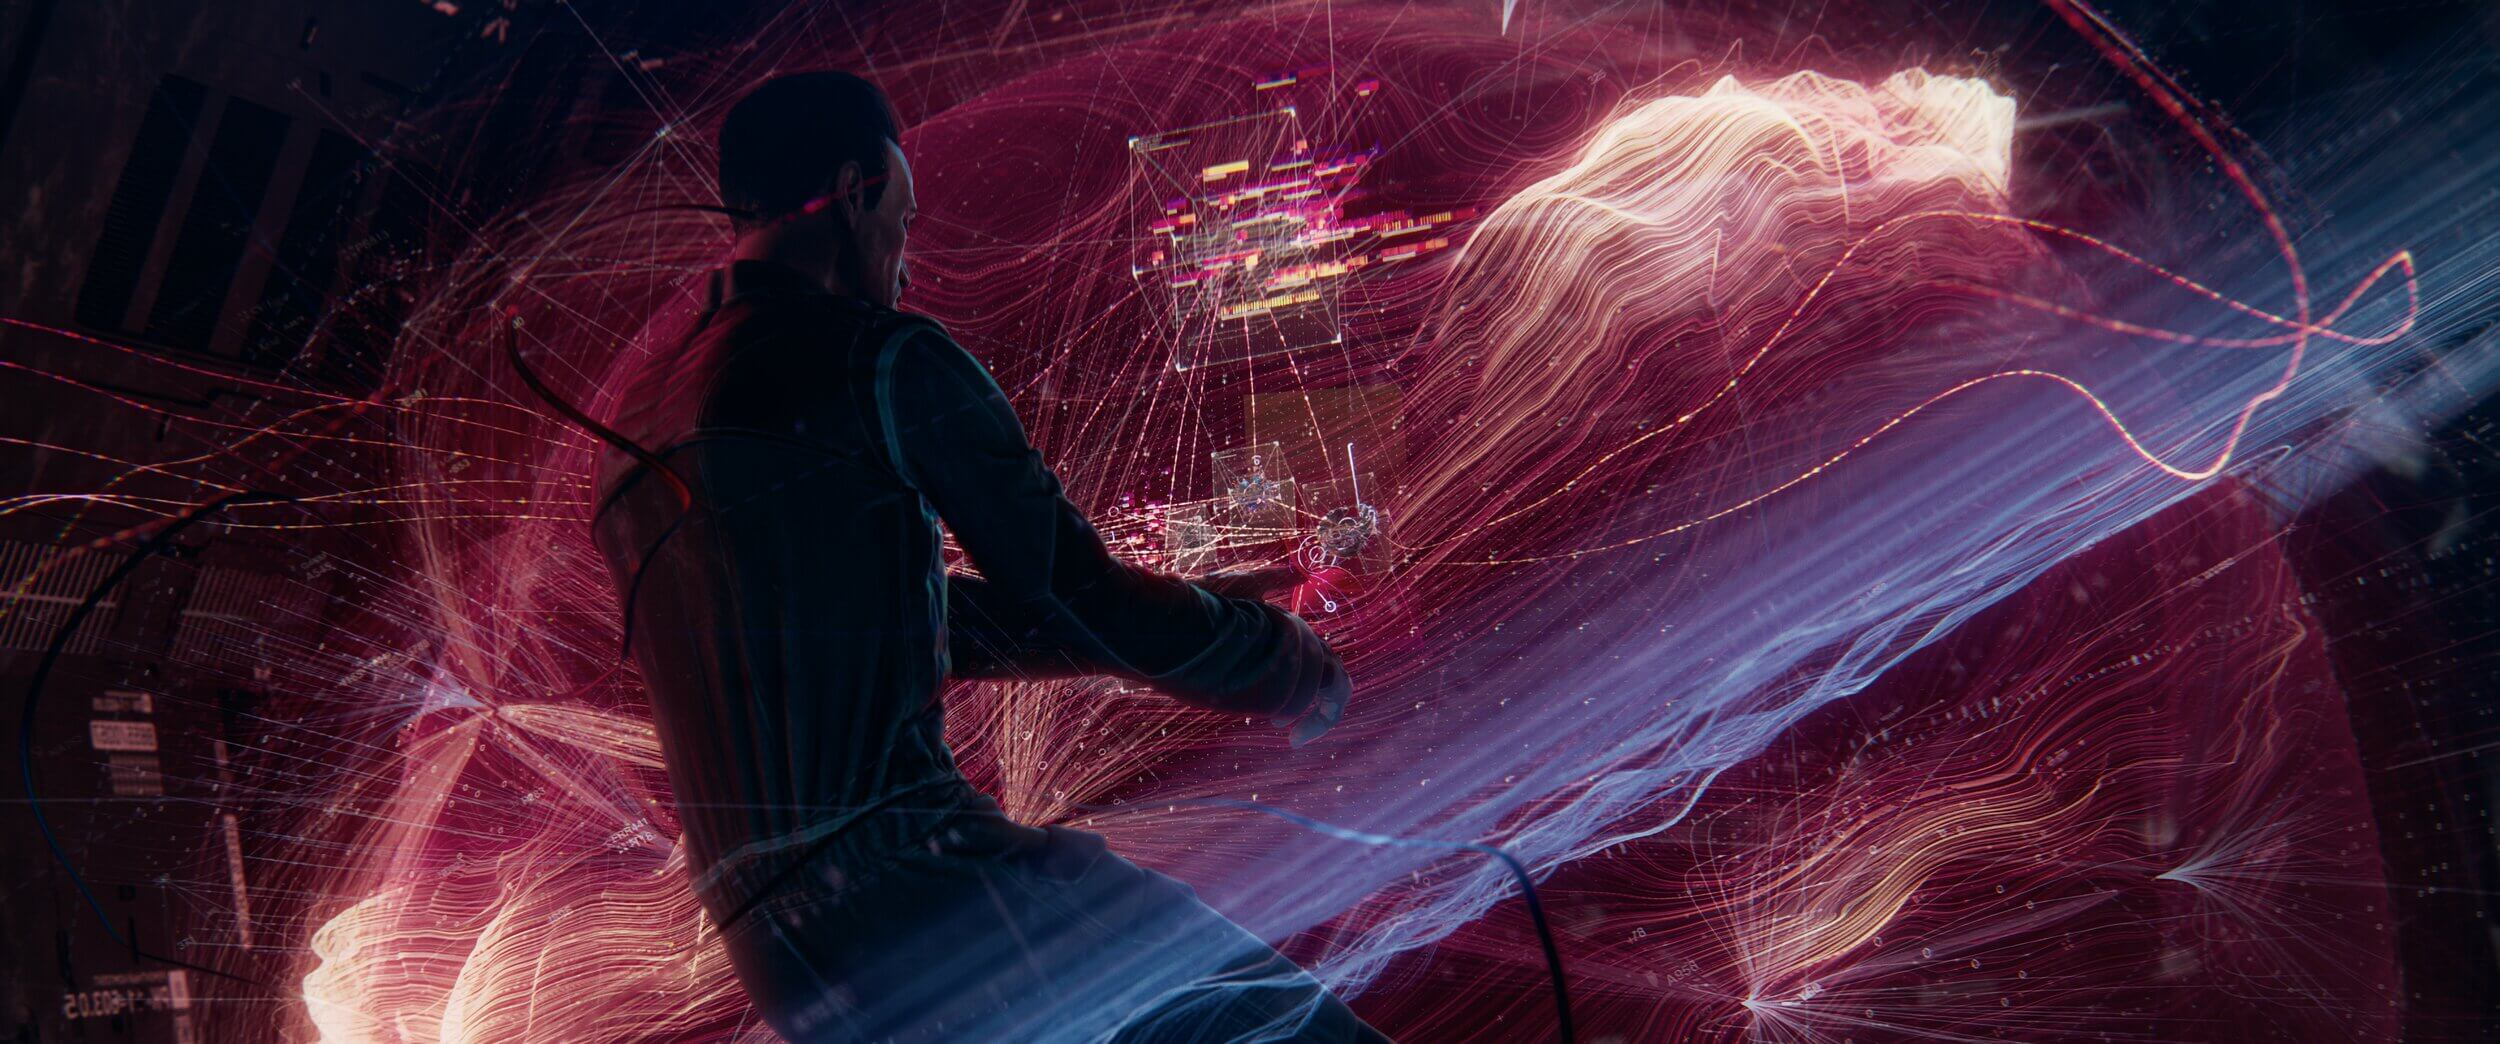 Image from Danil Krivoruchko's indie sci-fi short BLINDSIGHT, inspired by Peter Watts novel